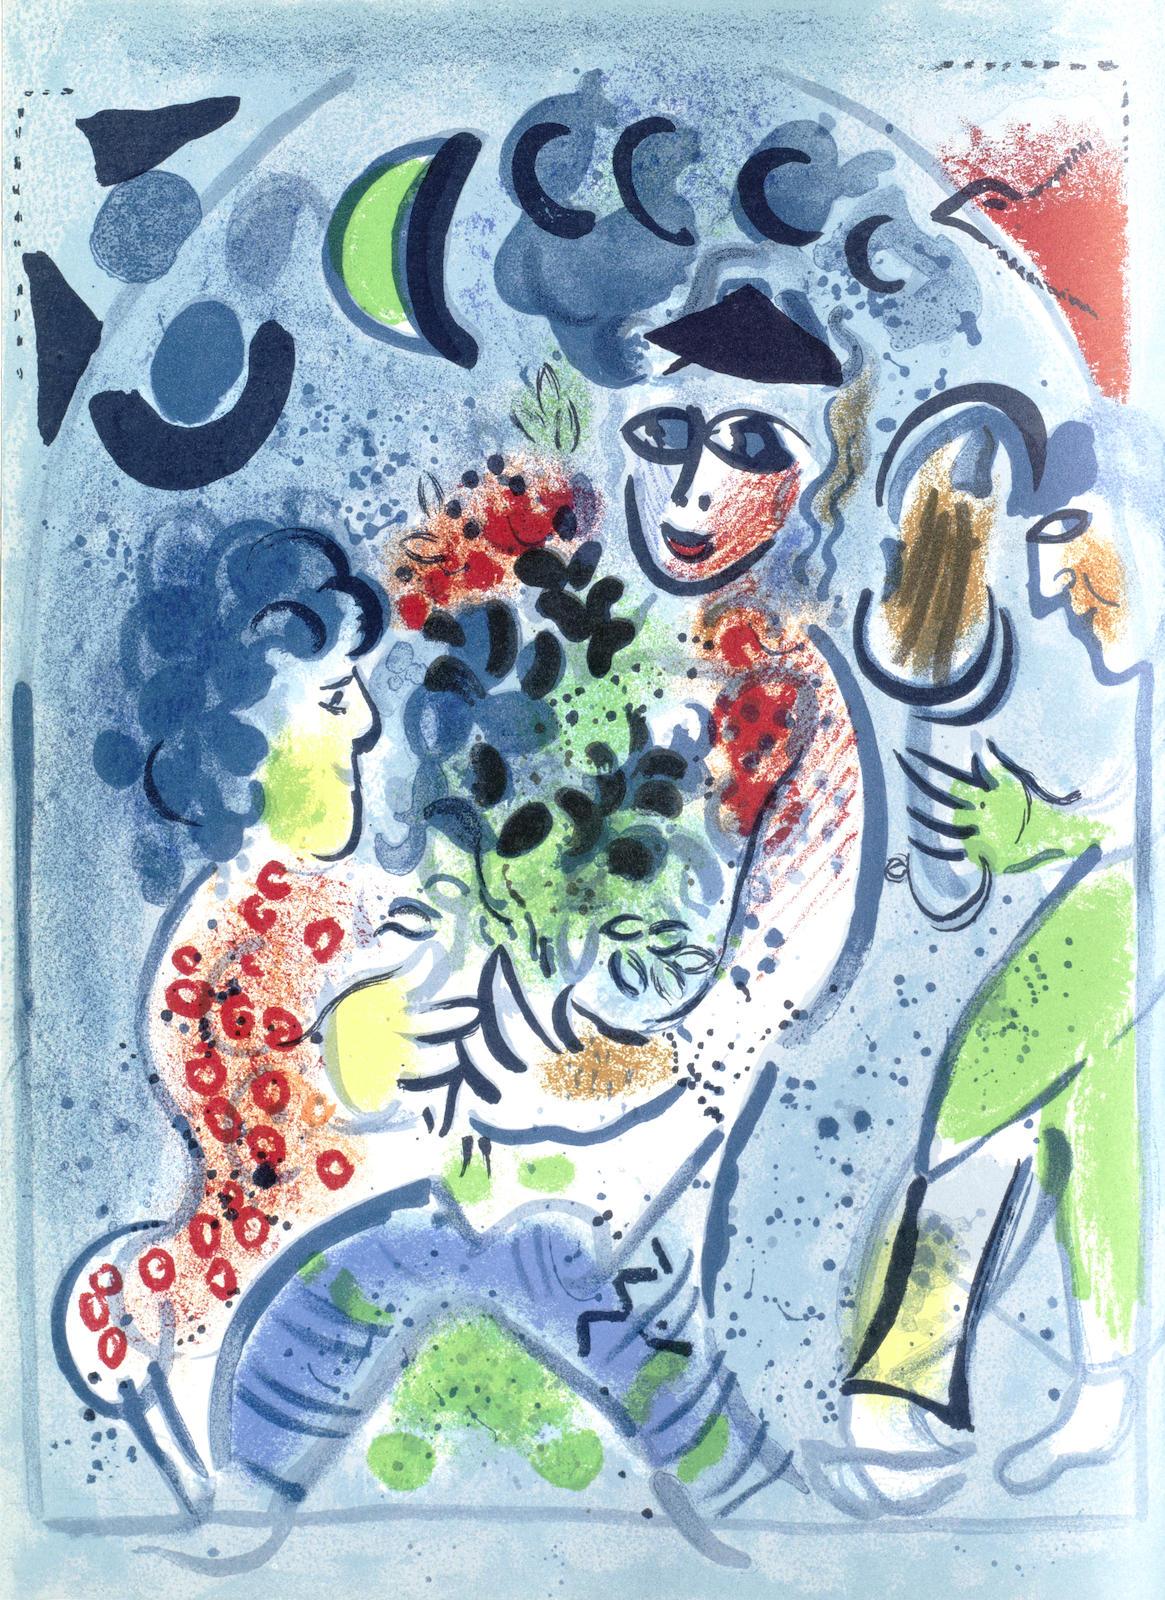 Marc Chagall-Chagall Lithographe I-VI-1986